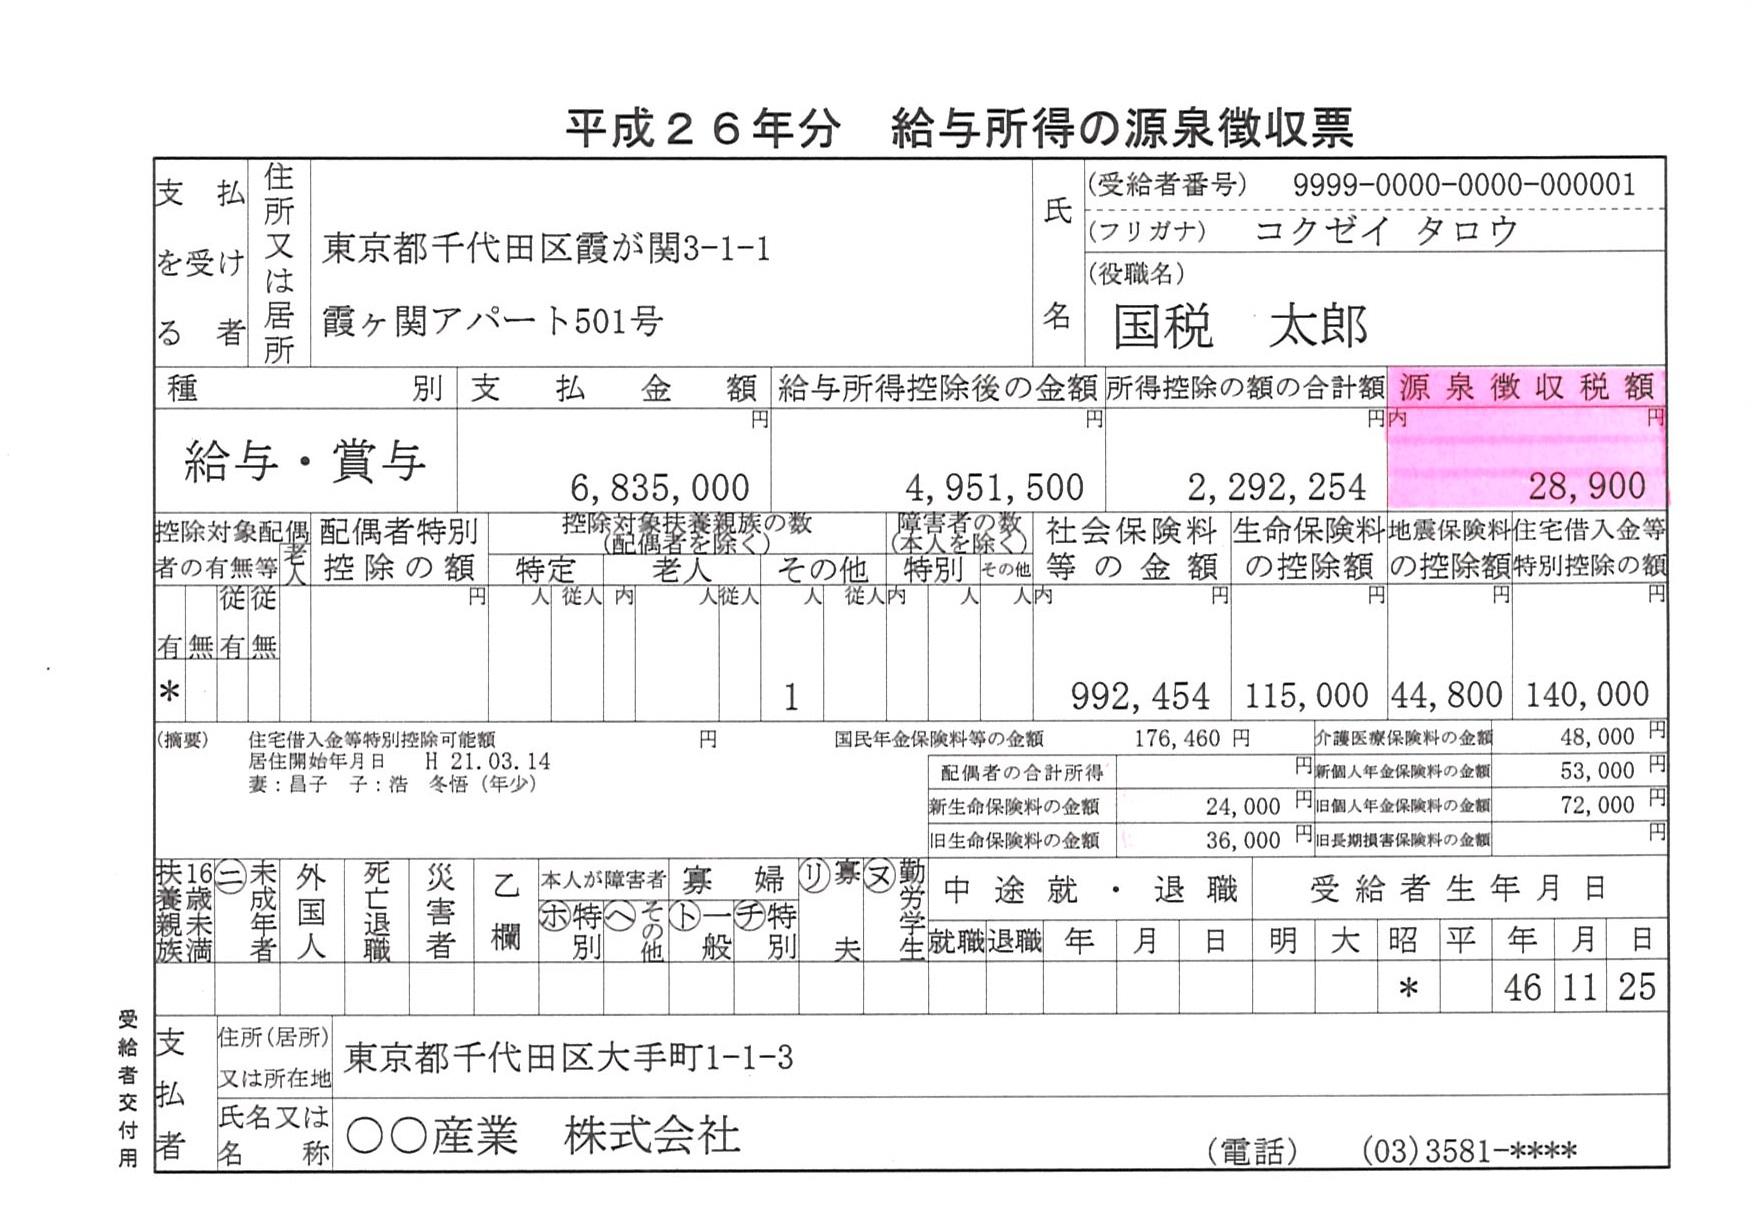 平成26年源泉徴収票(例)